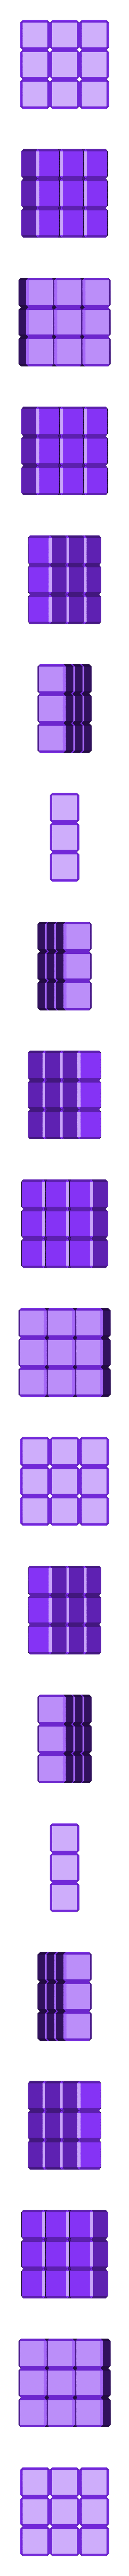 fiveTop.stl Download free STL file Nesting Cubes, Recursive Cubes, Cubes within Cubes • 3D printer template, LGBU